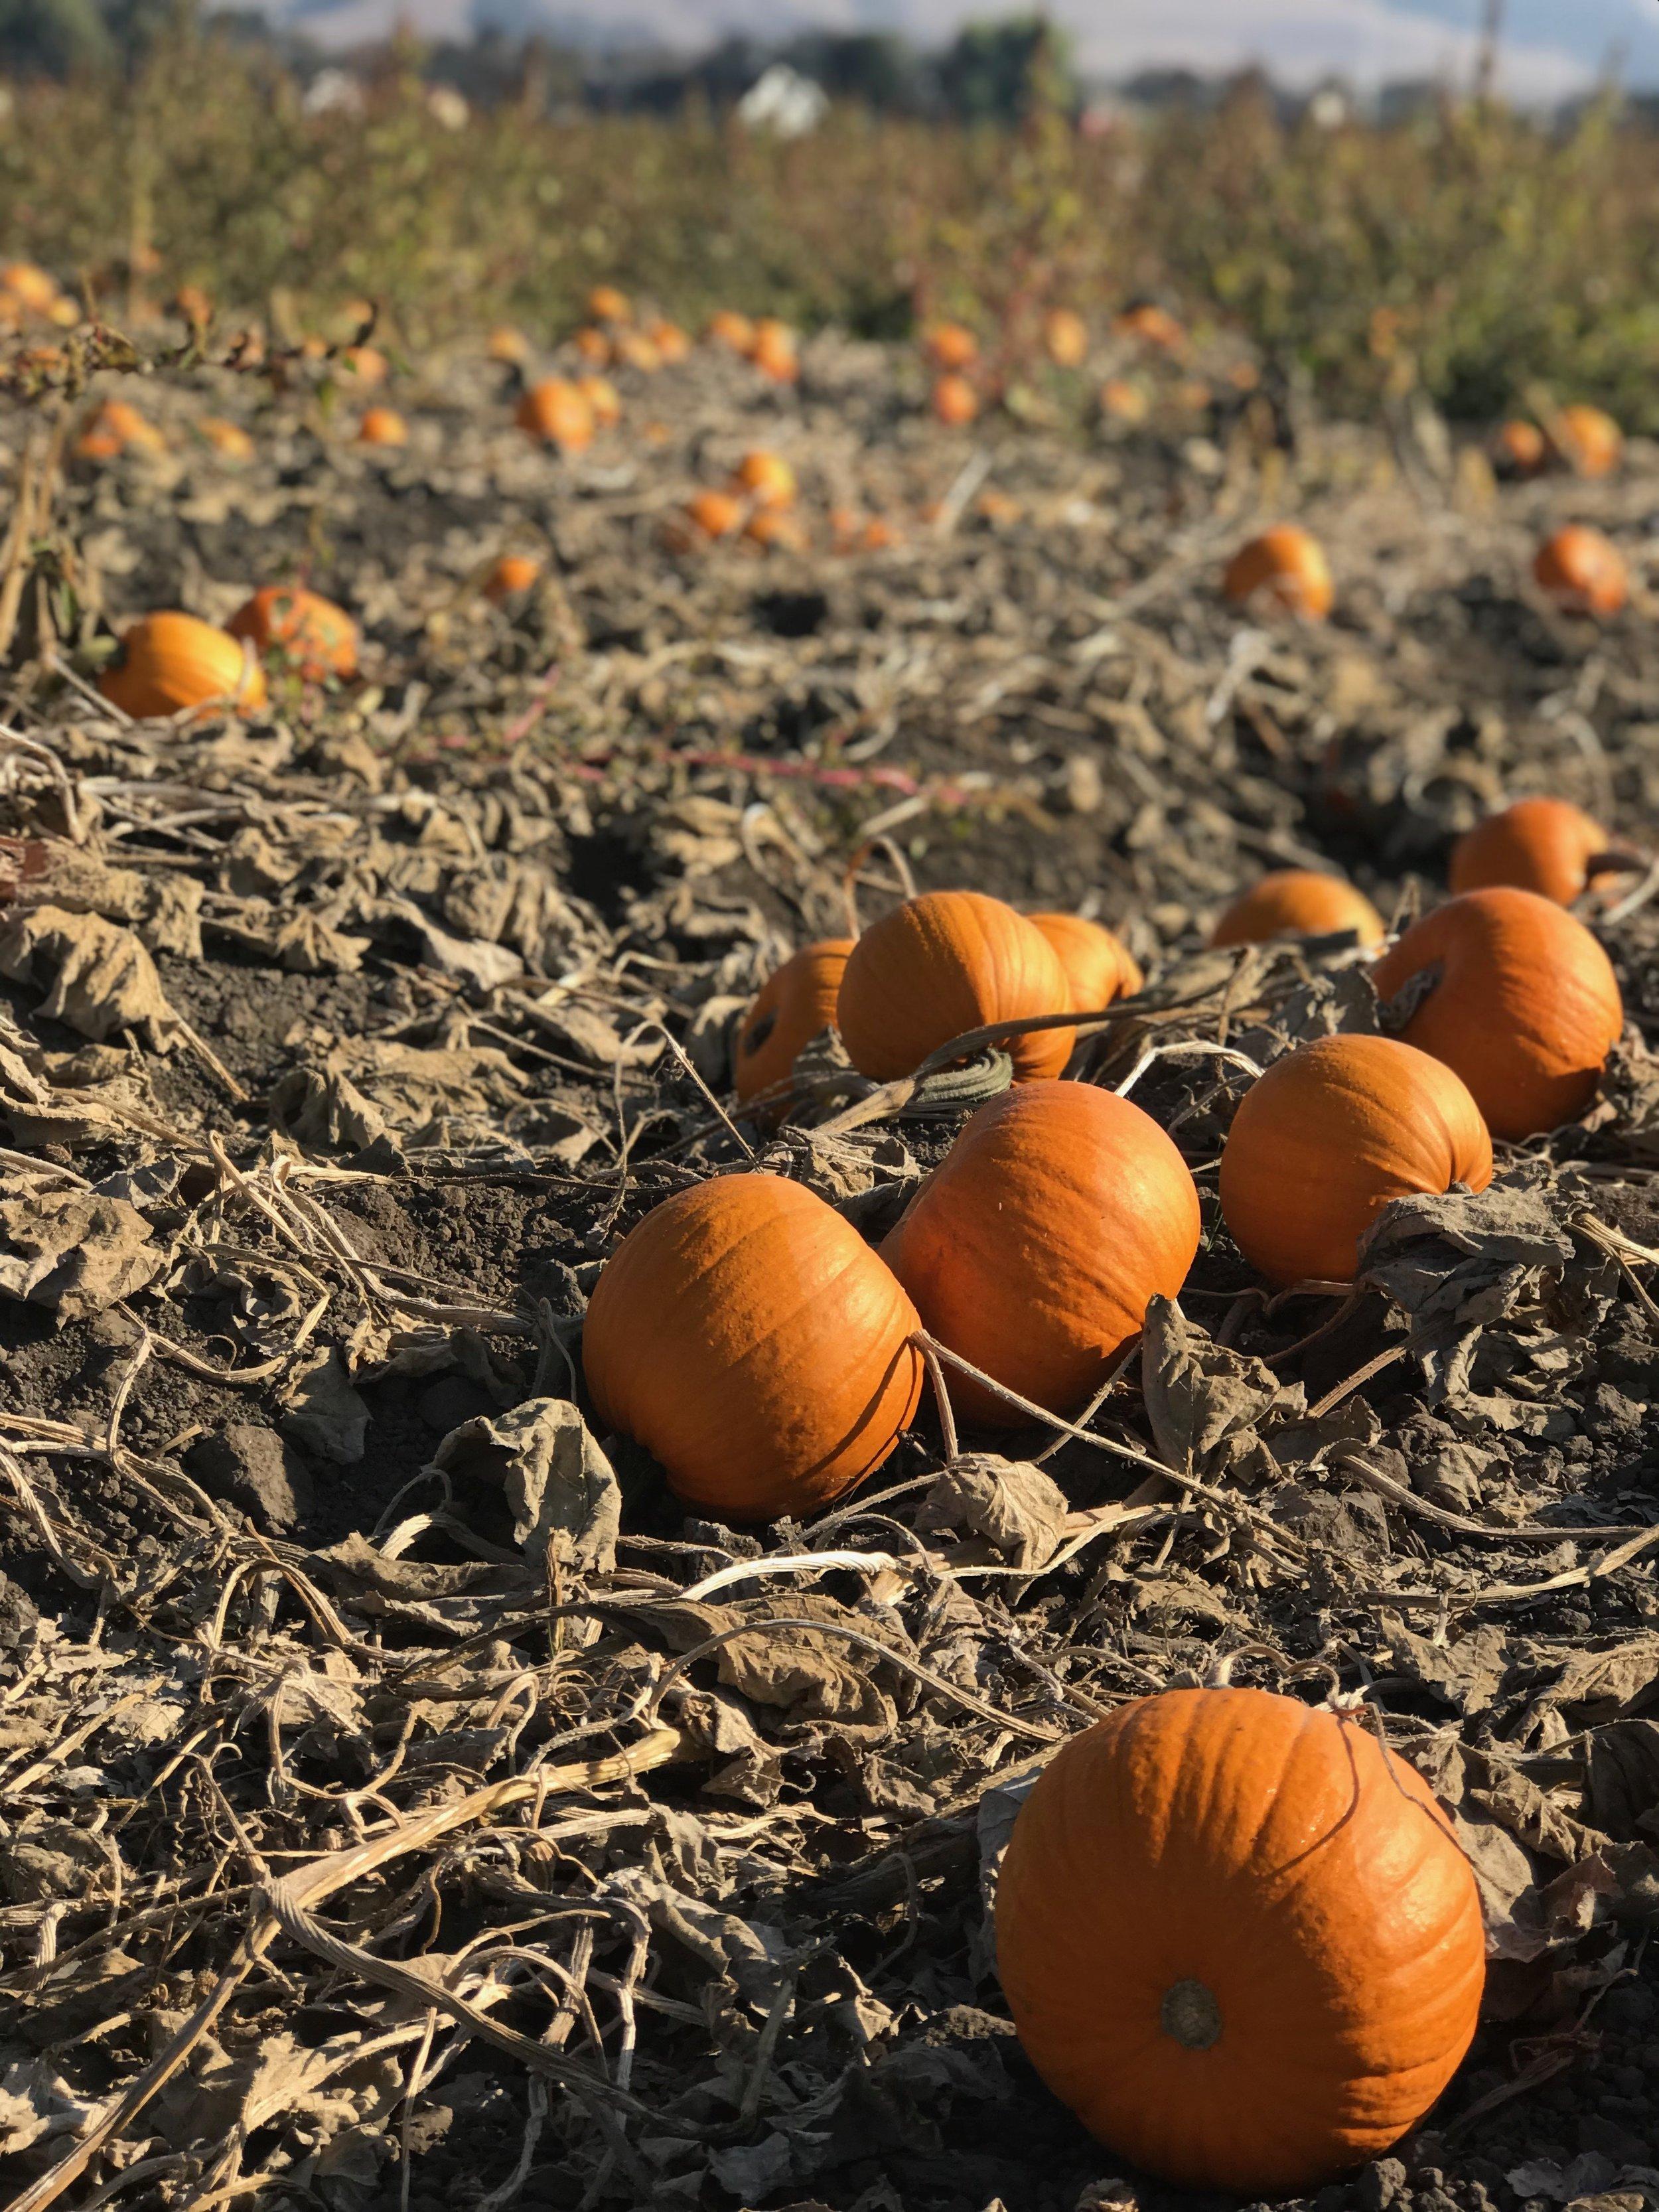 Pumpkins in the Field.JPG